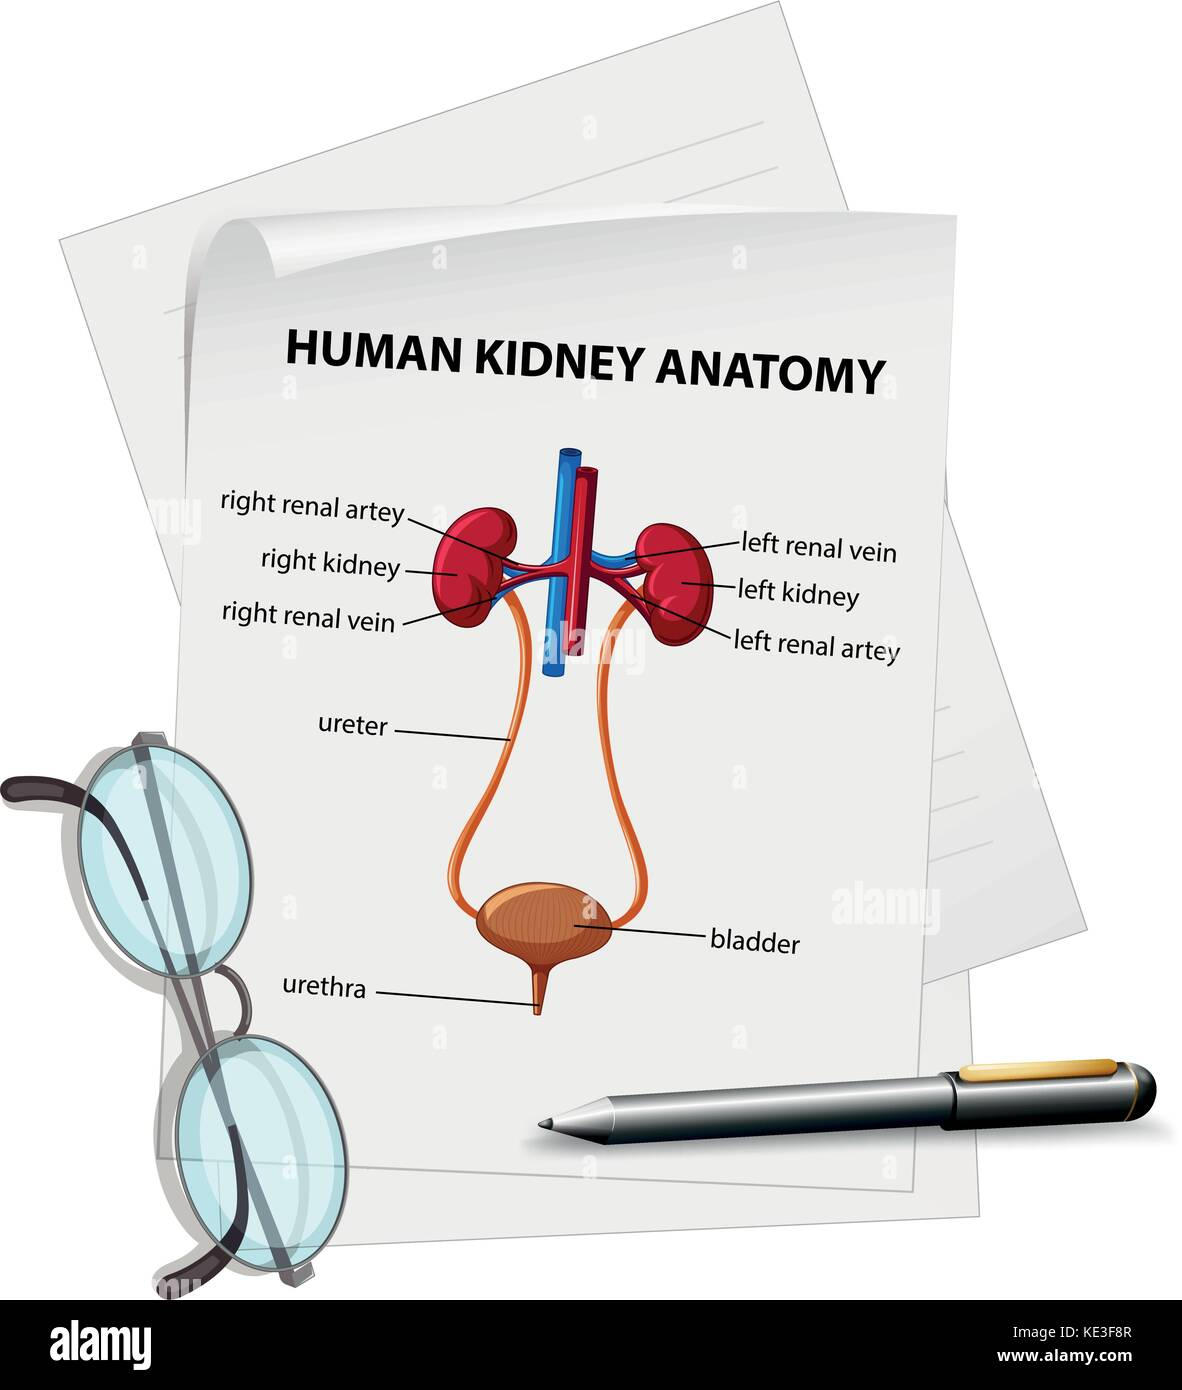 Organs Diagram Isolated Stockfotos & Organs Diagram Isolated Bilder ...